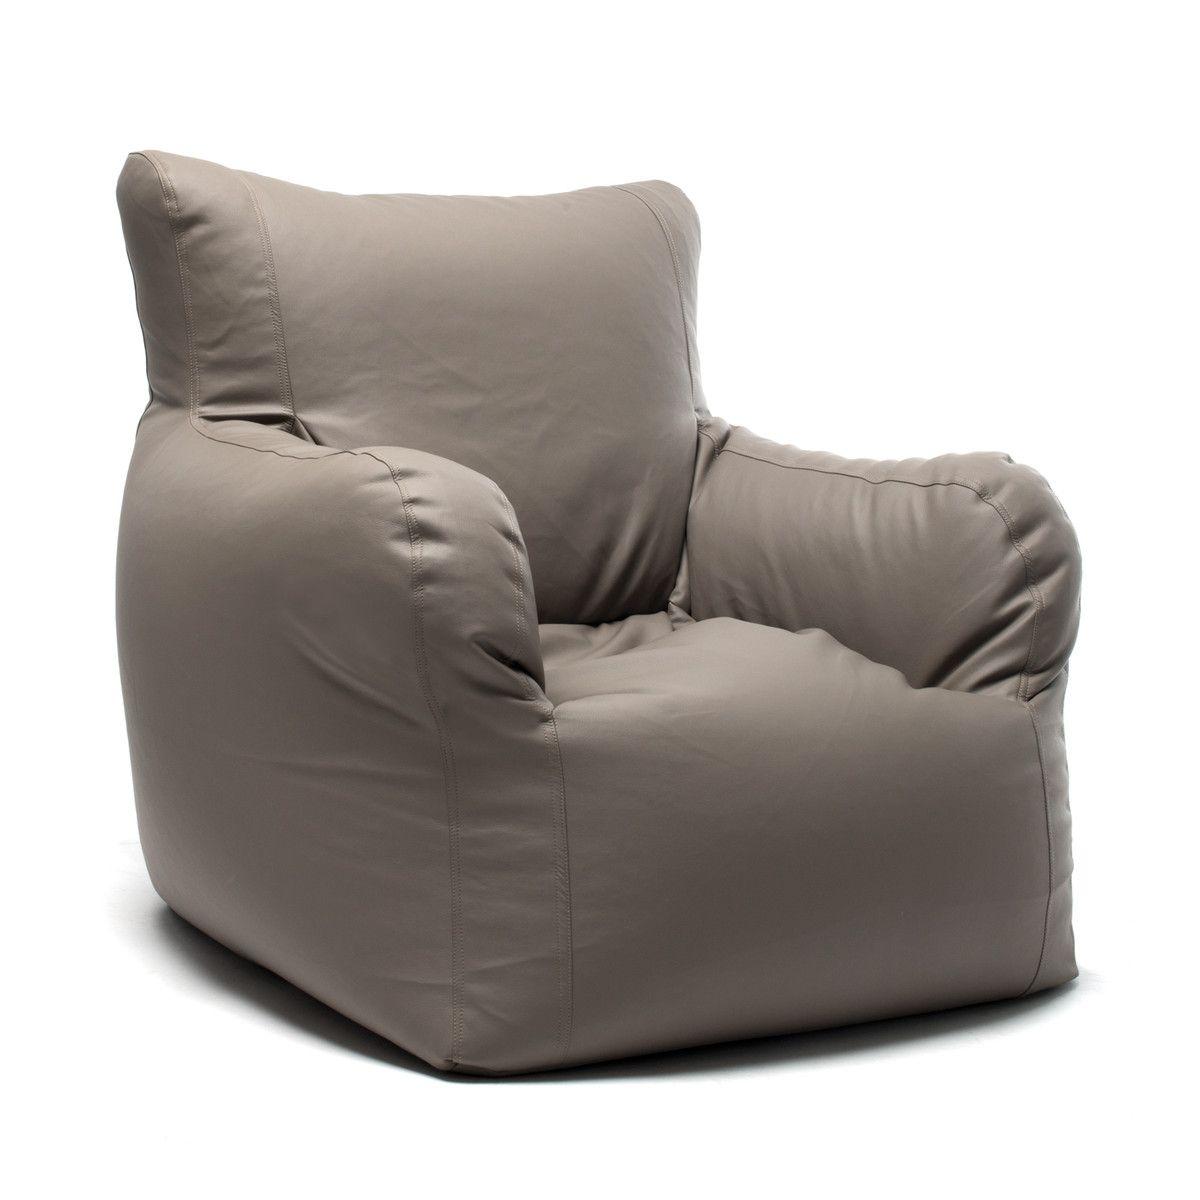 Blickfang Sessel Xl Das Beste Von Sitting Bull - Checker - Outdoor